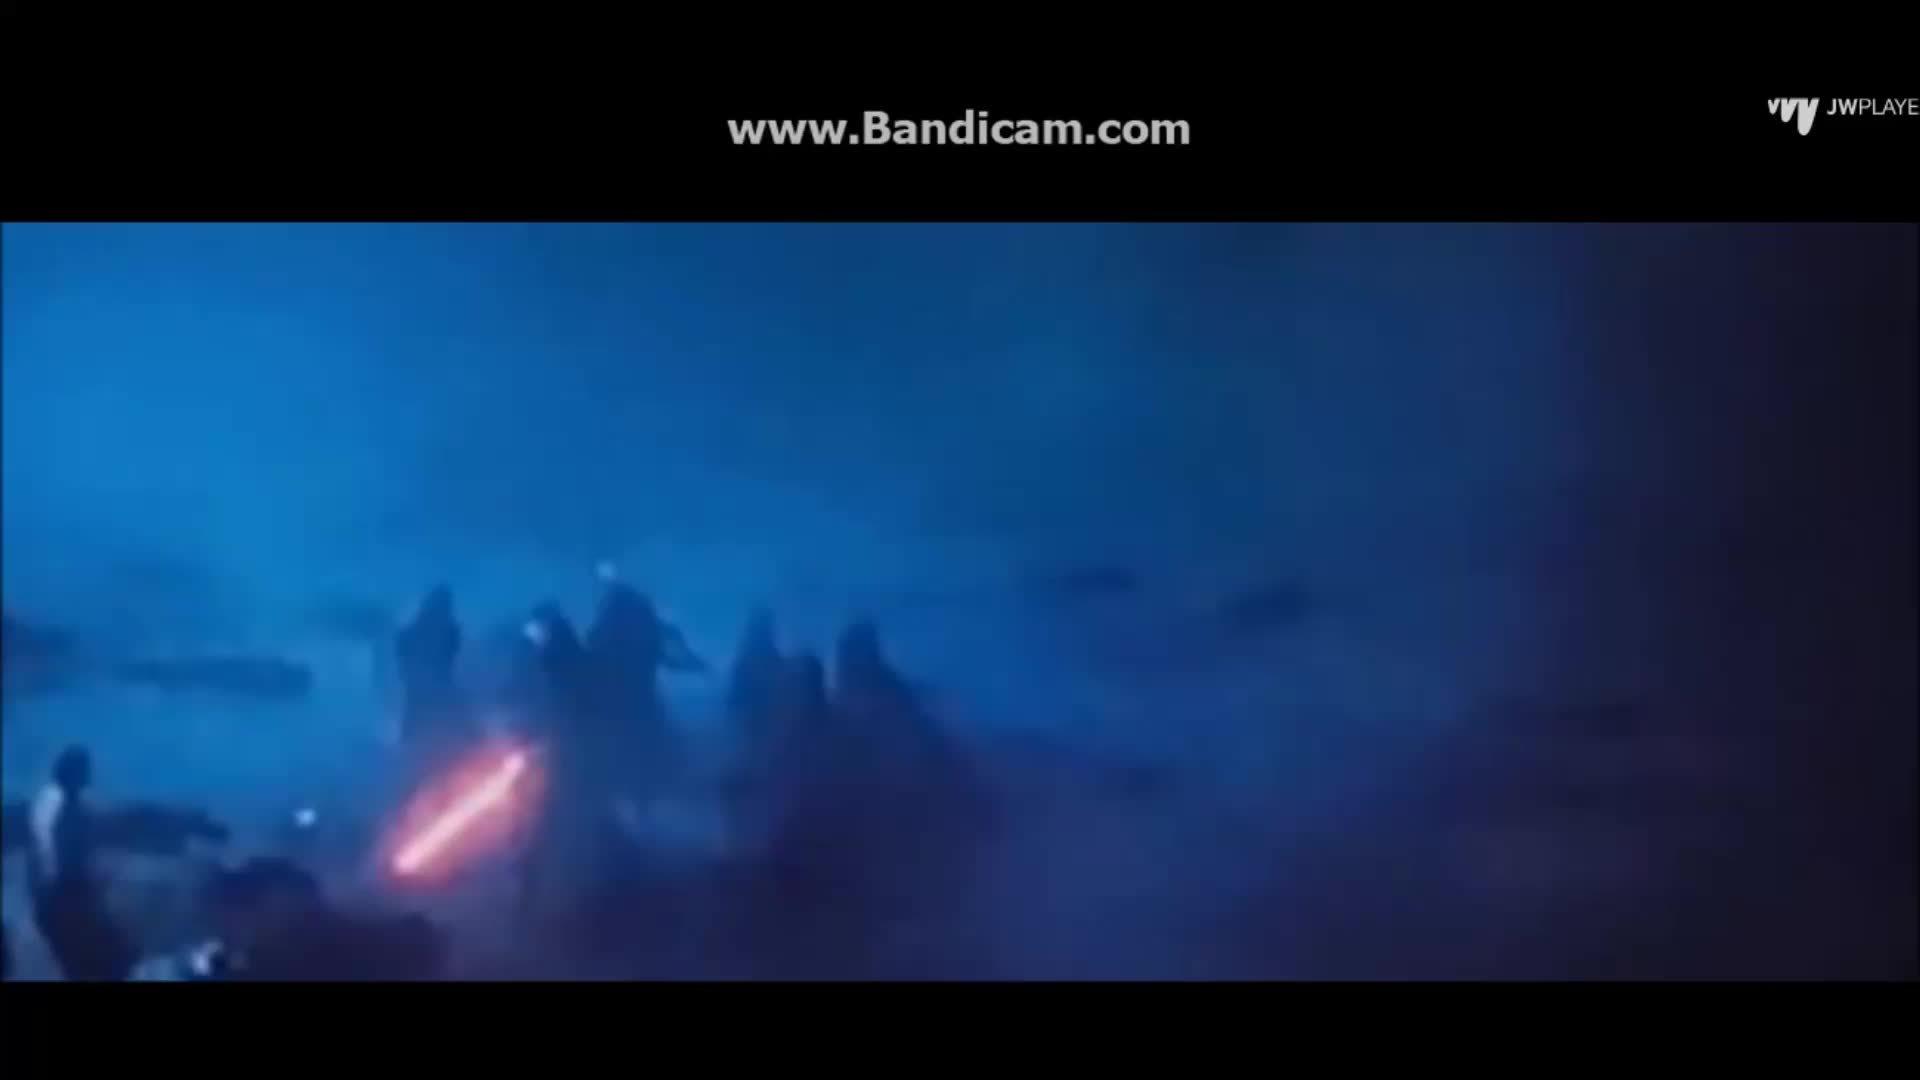 starwarsleaks, Jedi Temple GIFs